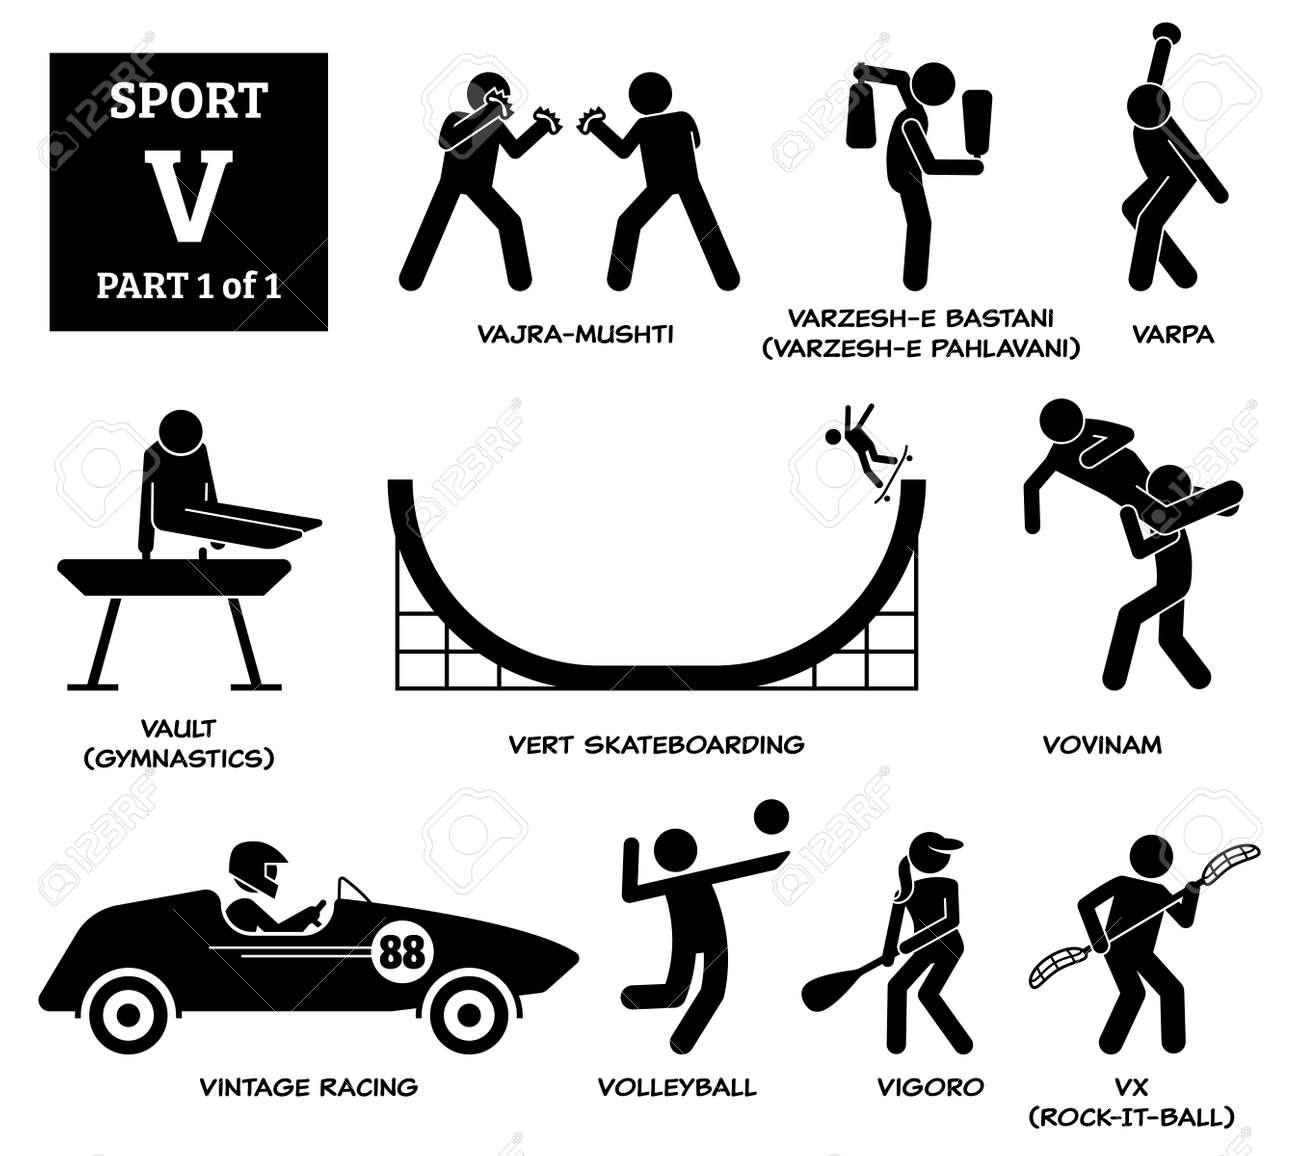 Sport games alphabet V vector icons pictogram. Vajra-mushti, varzesh-e Bastani, varpa, vault gymnastic, vert skateboarding, vovinam, vintage racing, volleyball, vigoro, and vx rock-it-ball. - 172367802